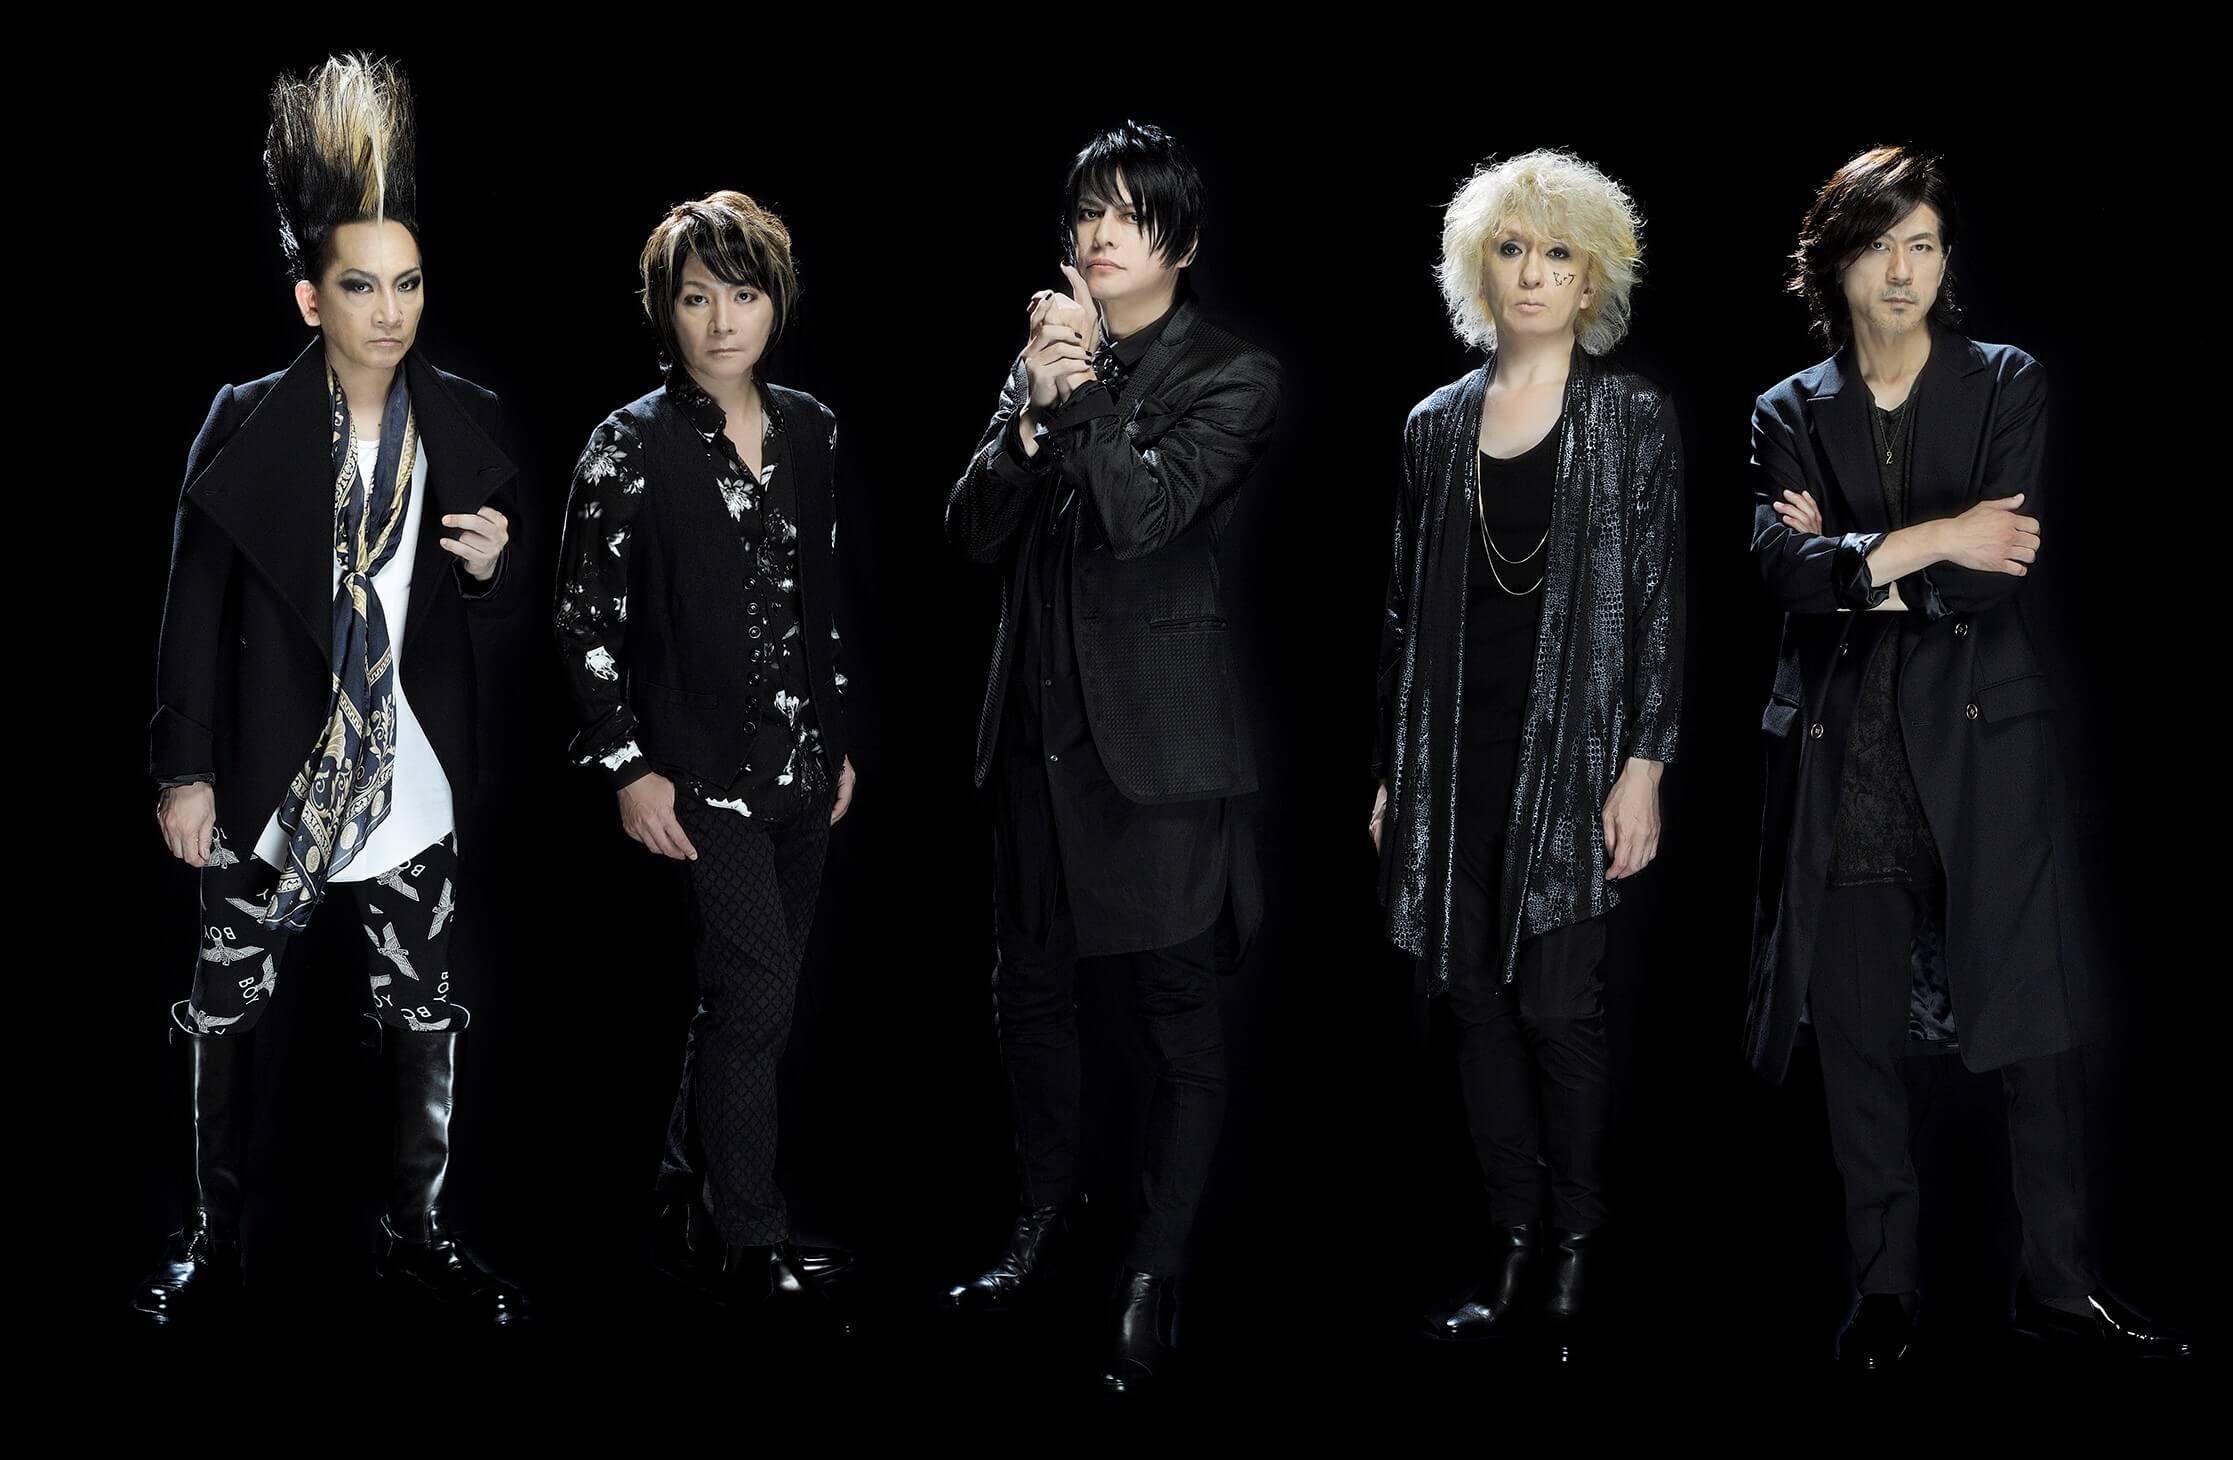 BUCK-TICK、ニューシングル『堕天使』 来年1月29日にリリース決定